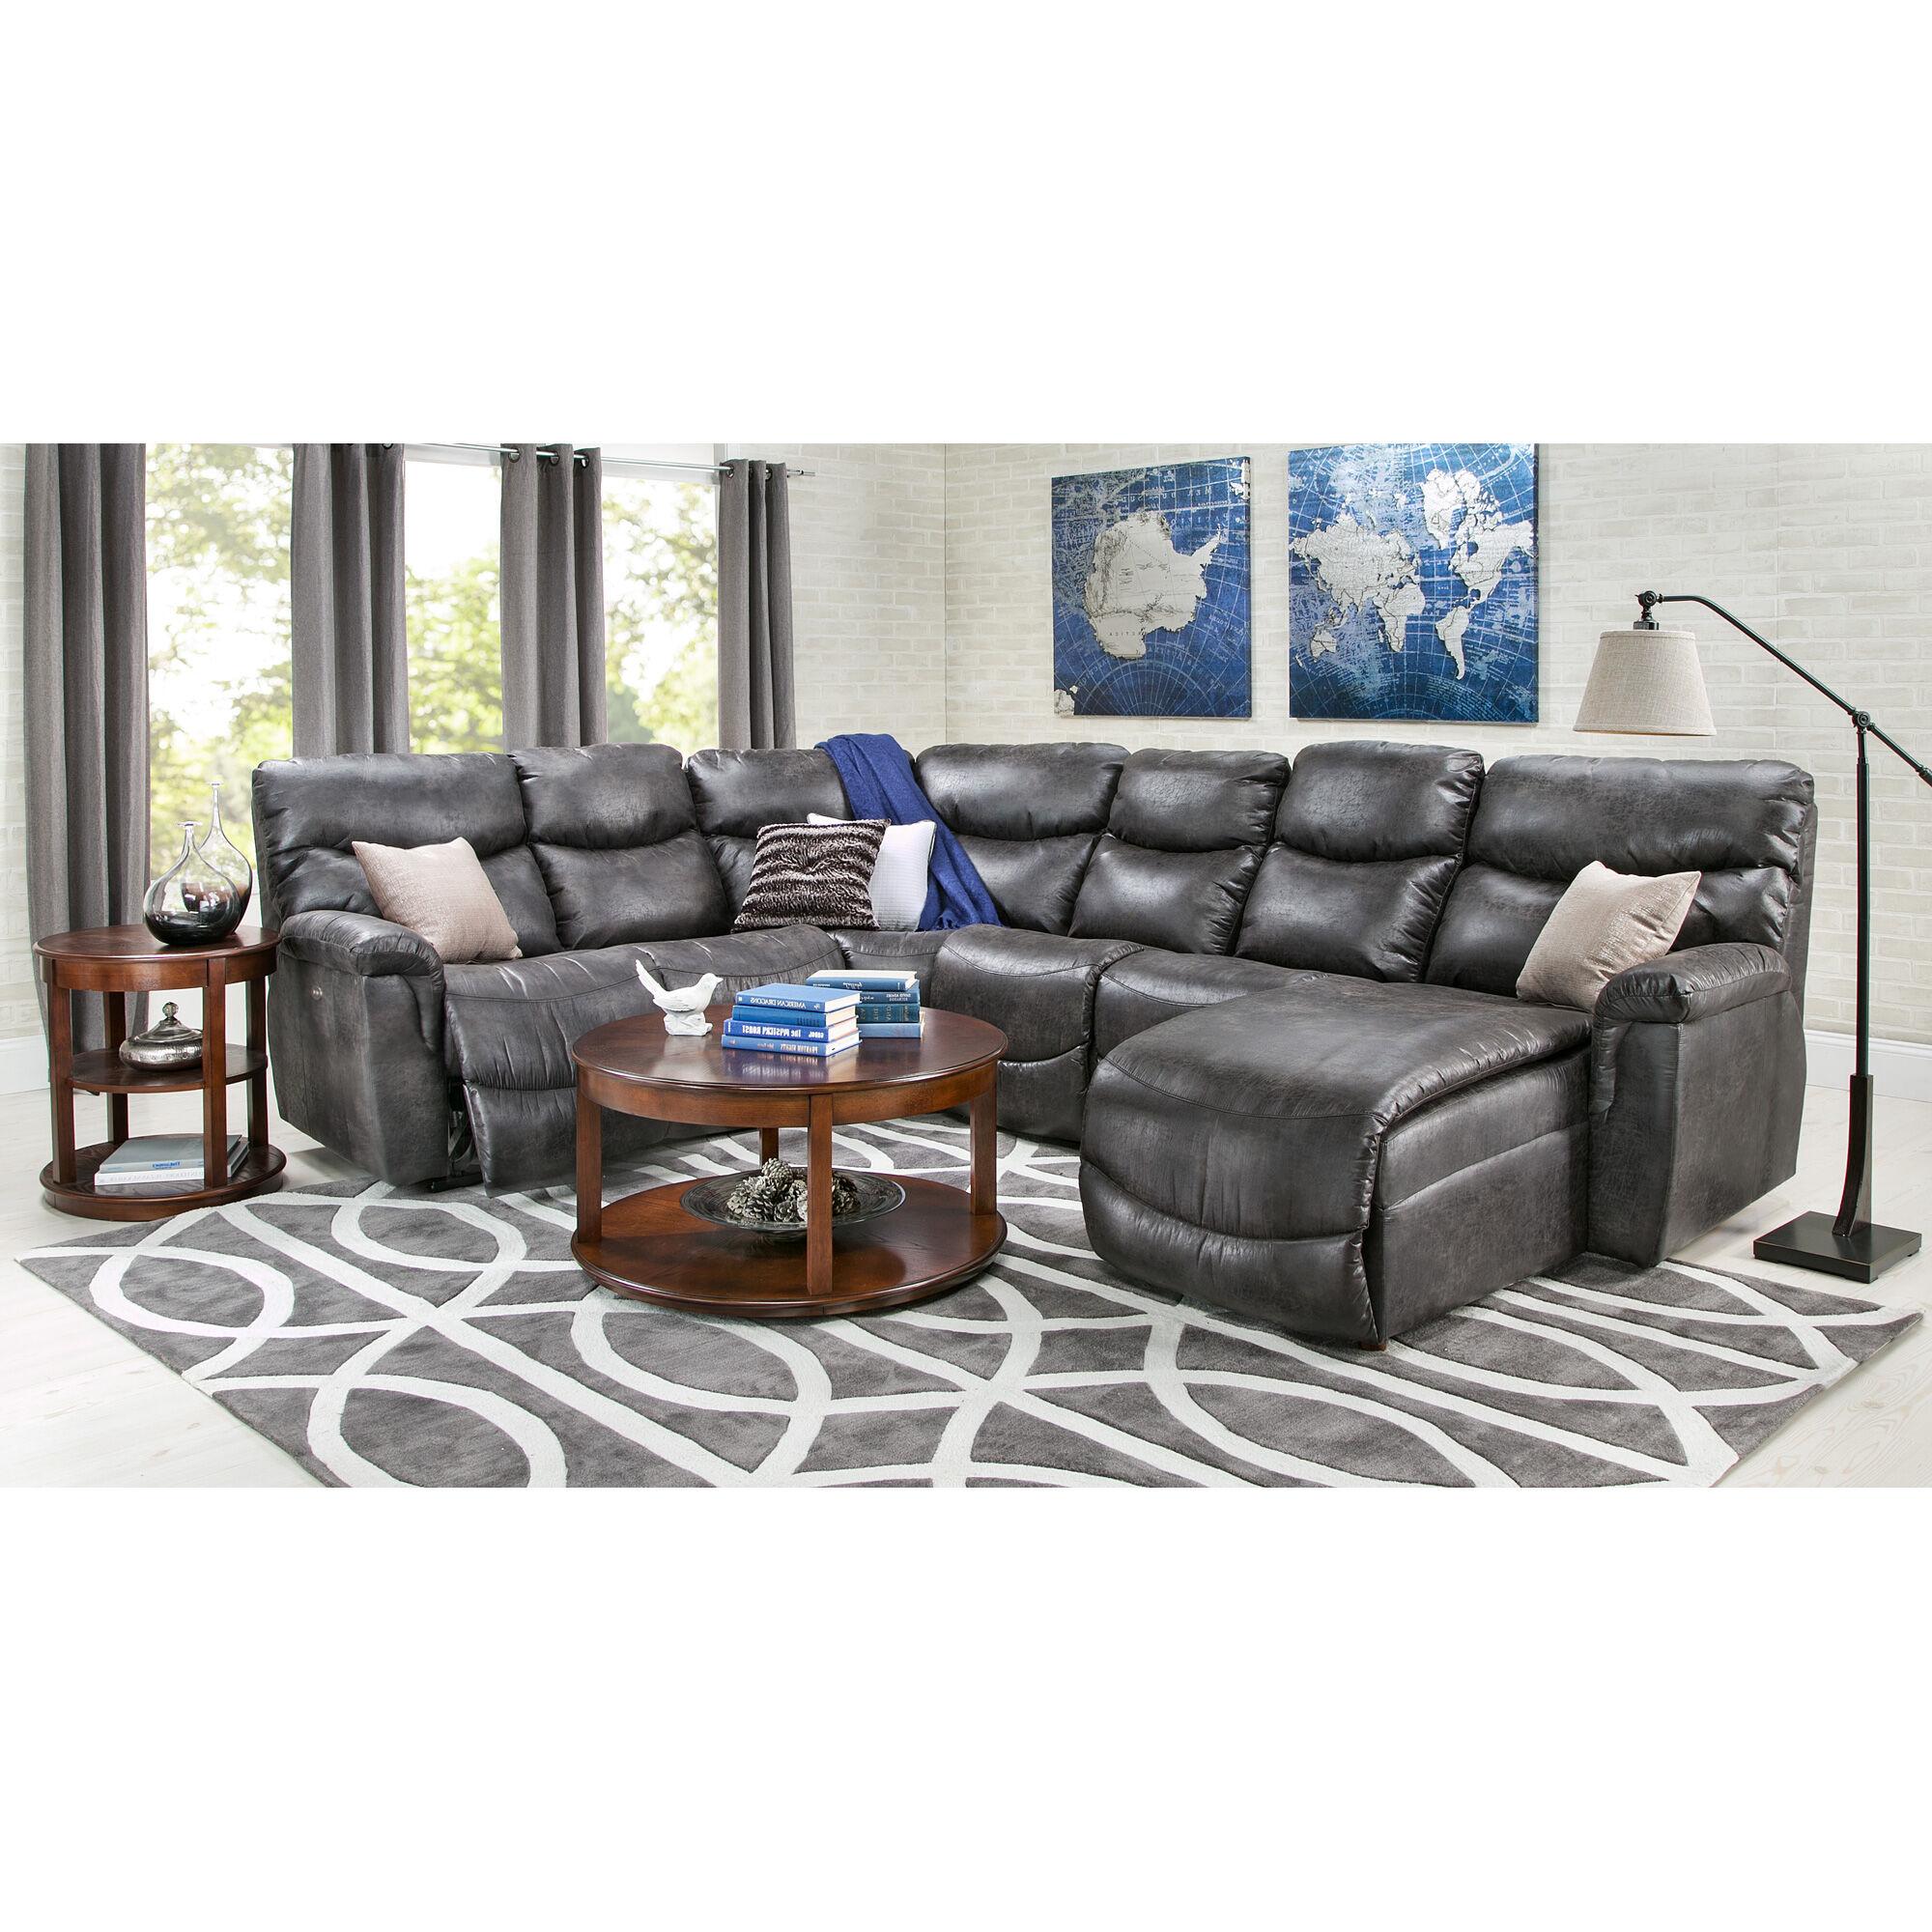 slumberland com sofas ashley damacio leather reclining sofa in dark brown furniture james sectional room group